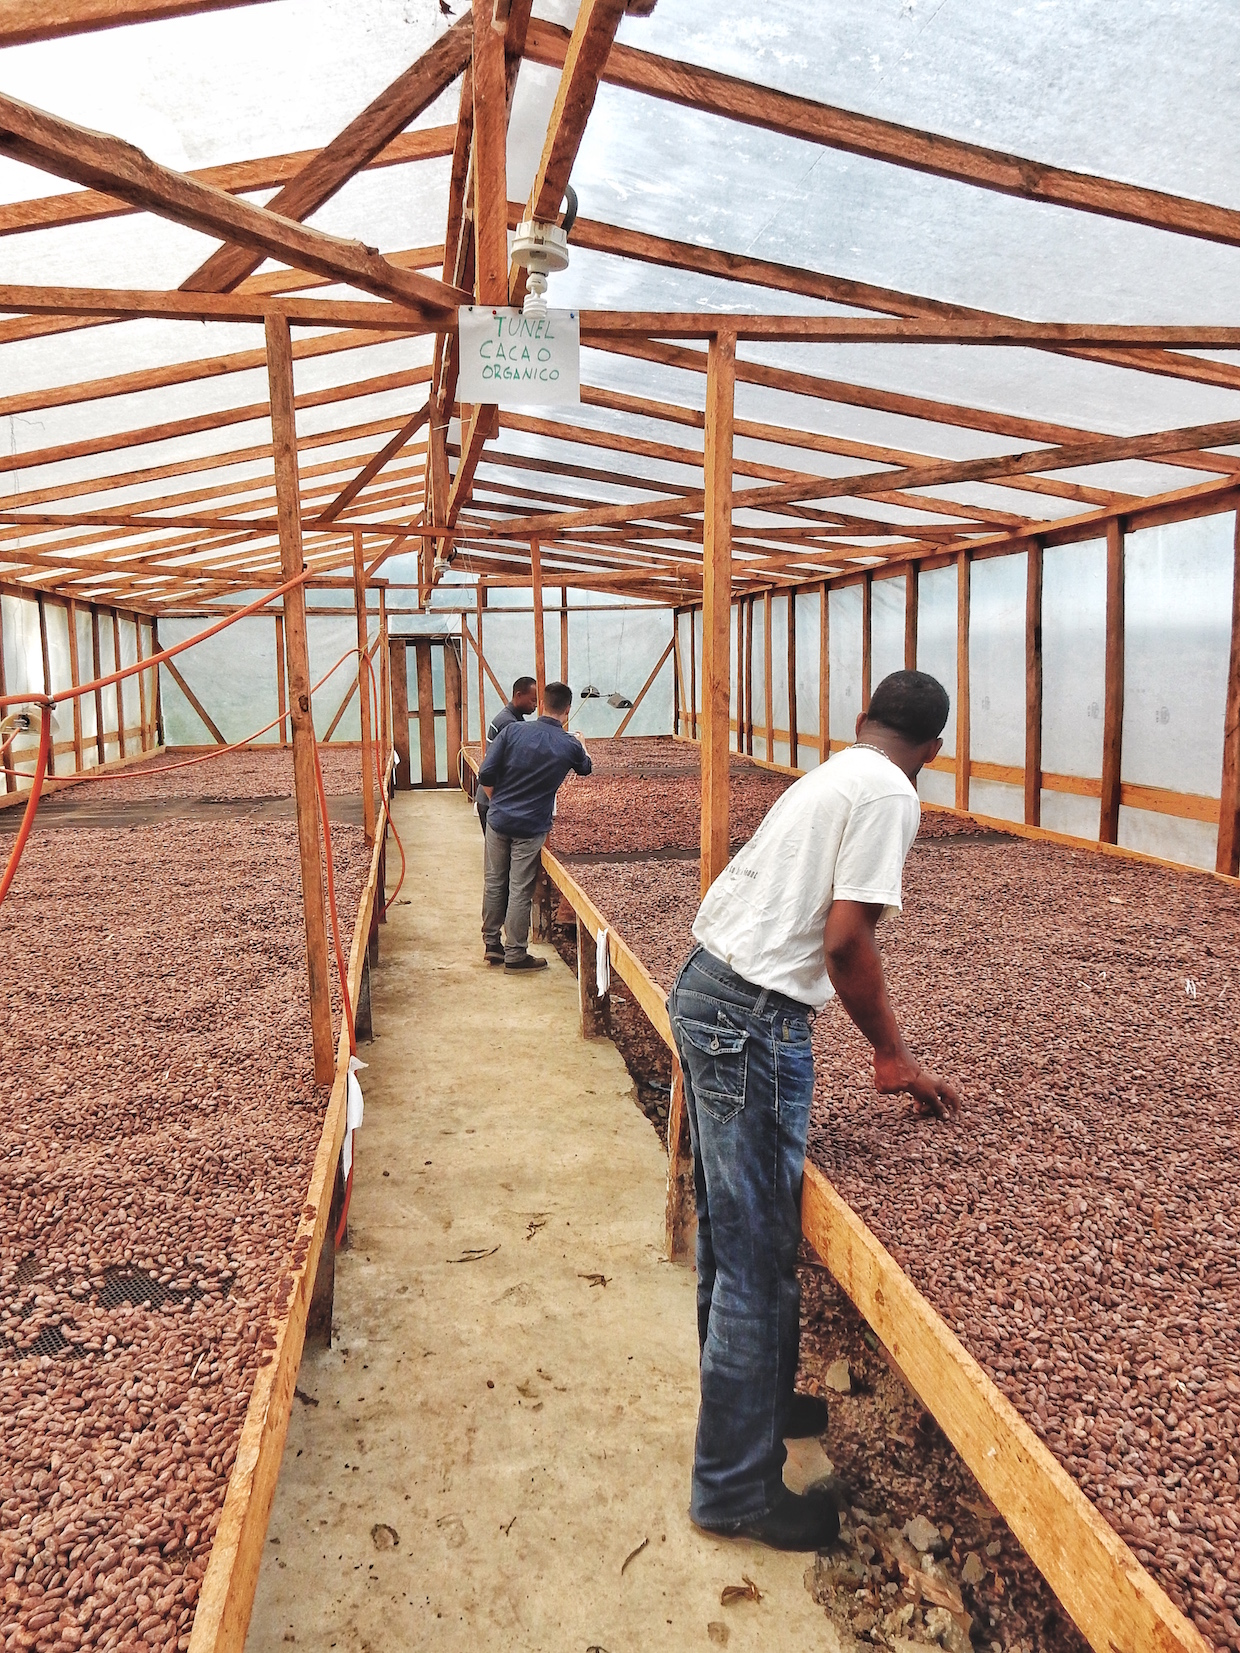 lits de séchage de cacao